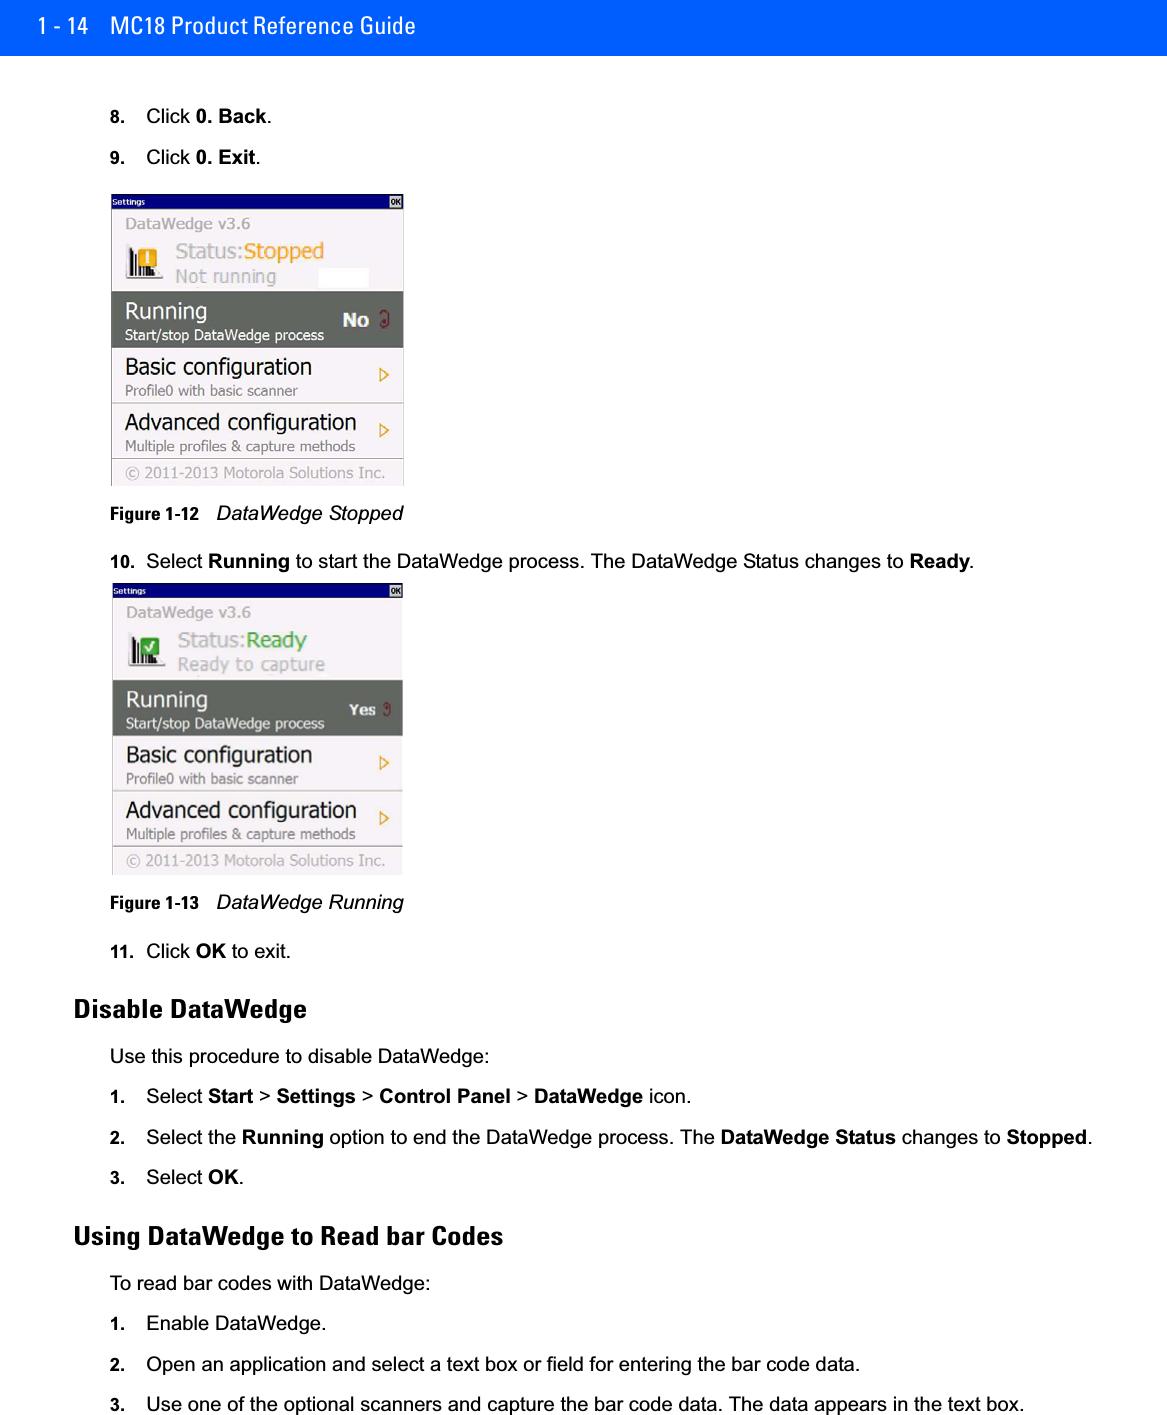 Symbol technologies motorola choice image symbols and meanings symbol technologies mc18n0 mc18 personal shopper barcode scanner page 30 of symbol technologies mc18n0 mc18 personal buycottarizona Gallery